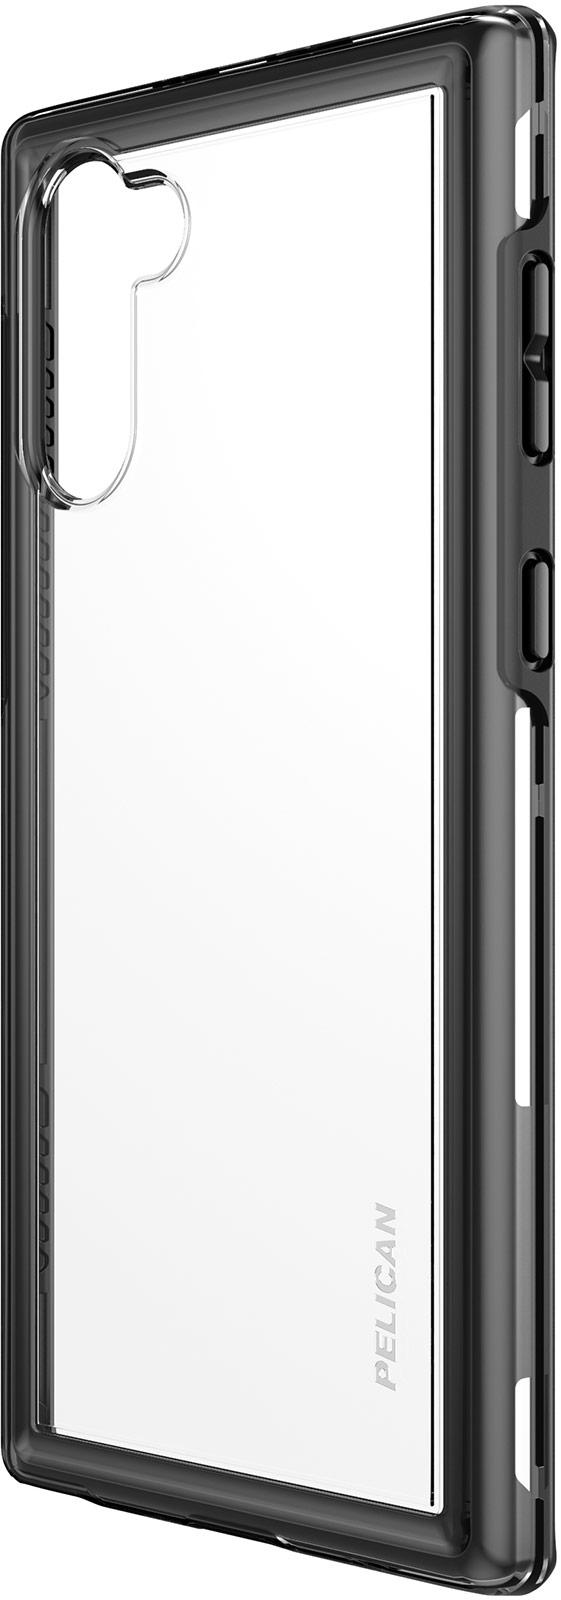 pelican samsung note10 adventurer black phone case